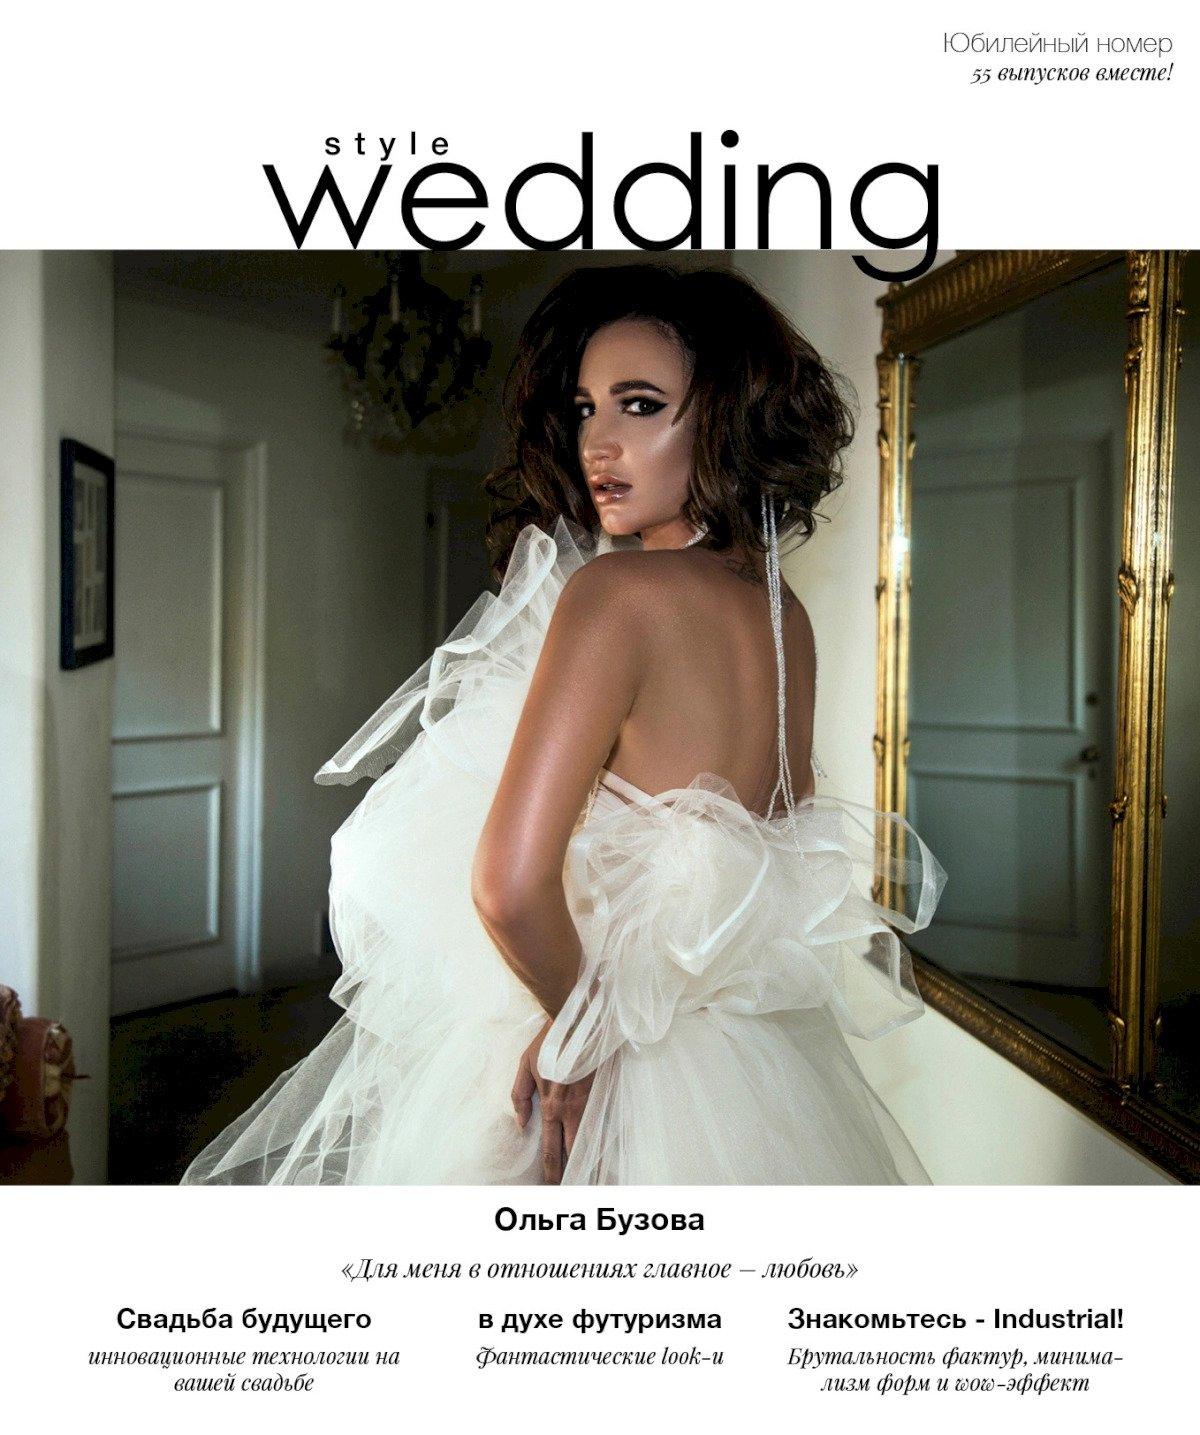 Публикация о нас в журнале Style Wedding